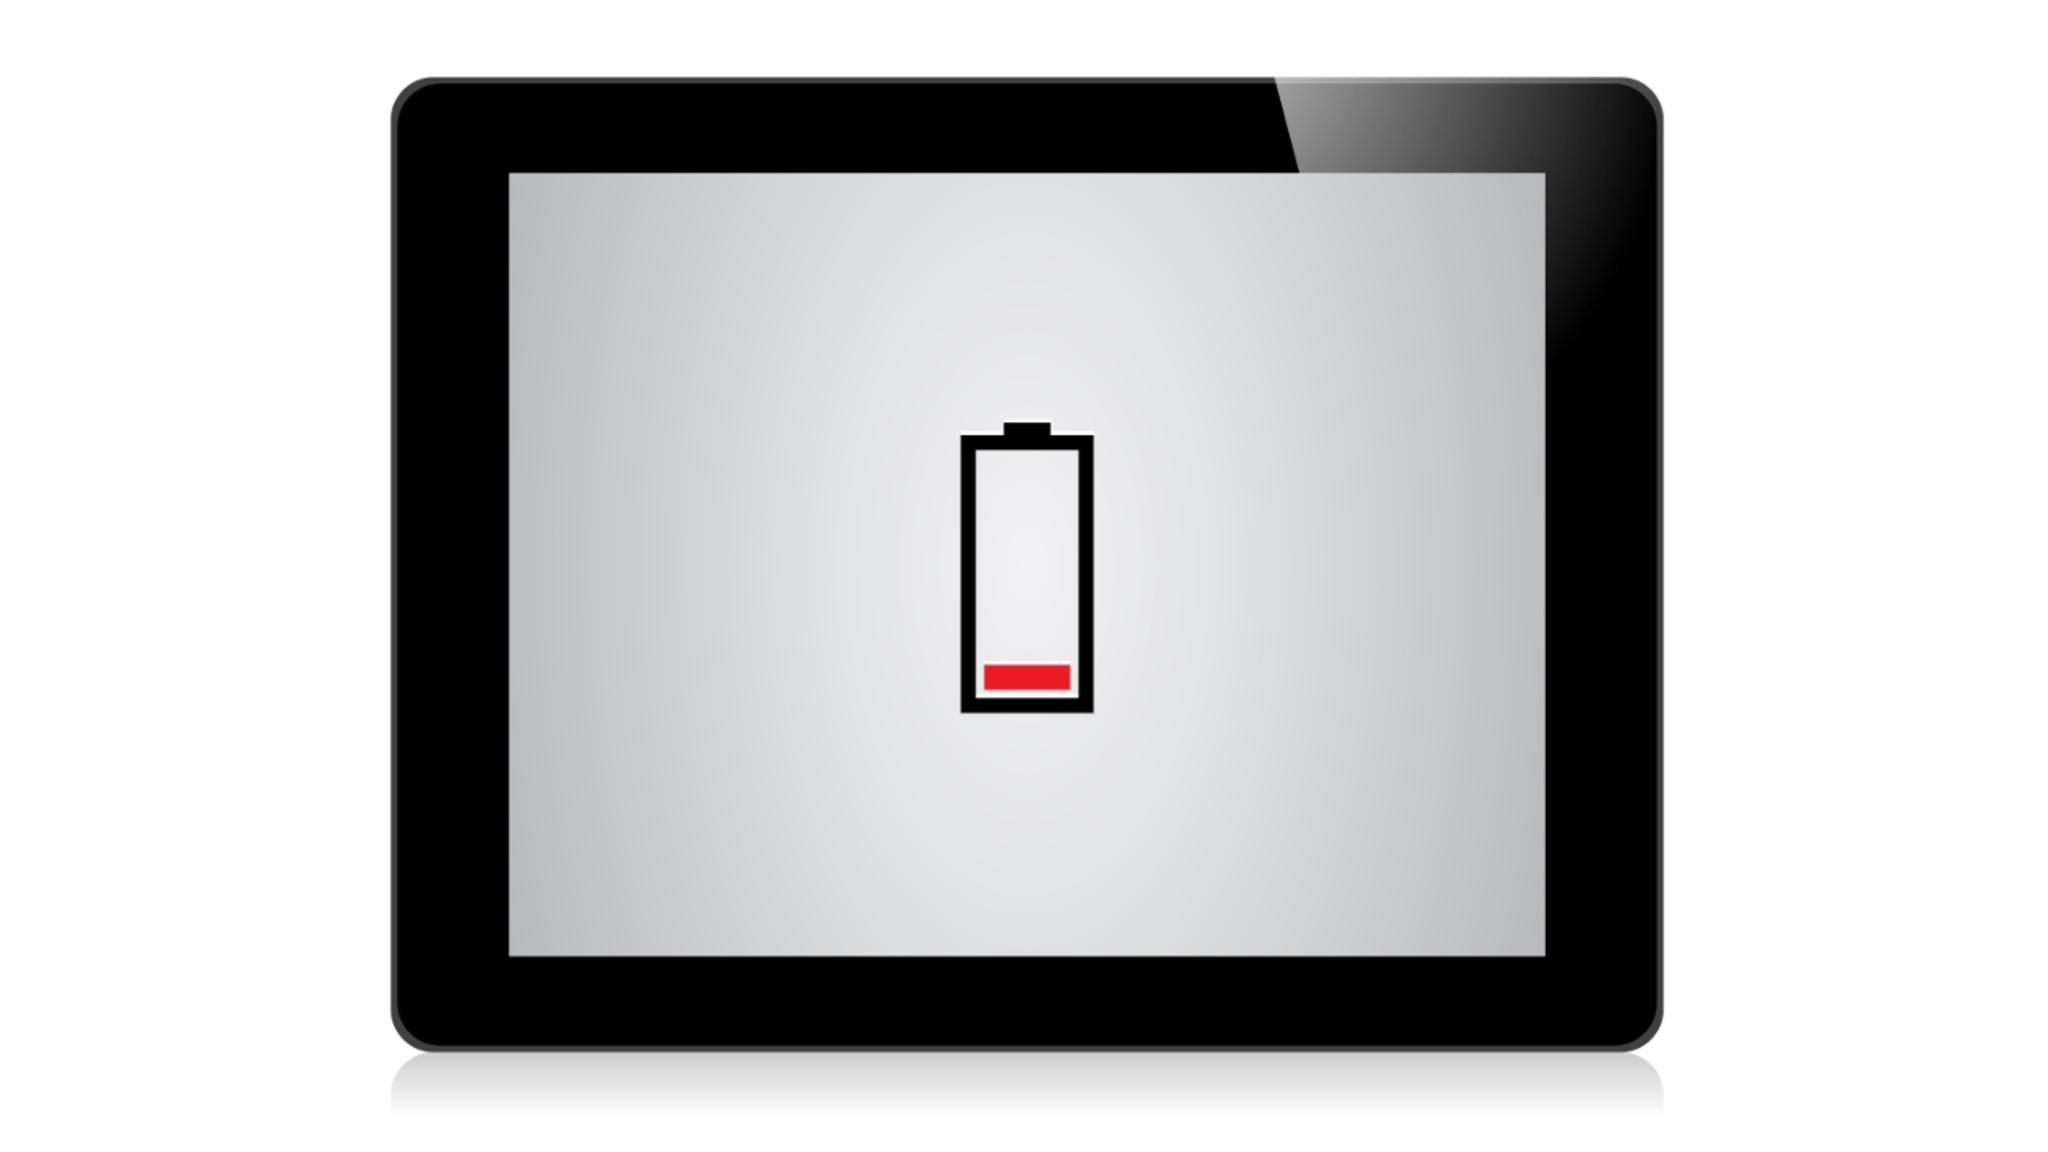 Akkuanzeige auf dem iPad